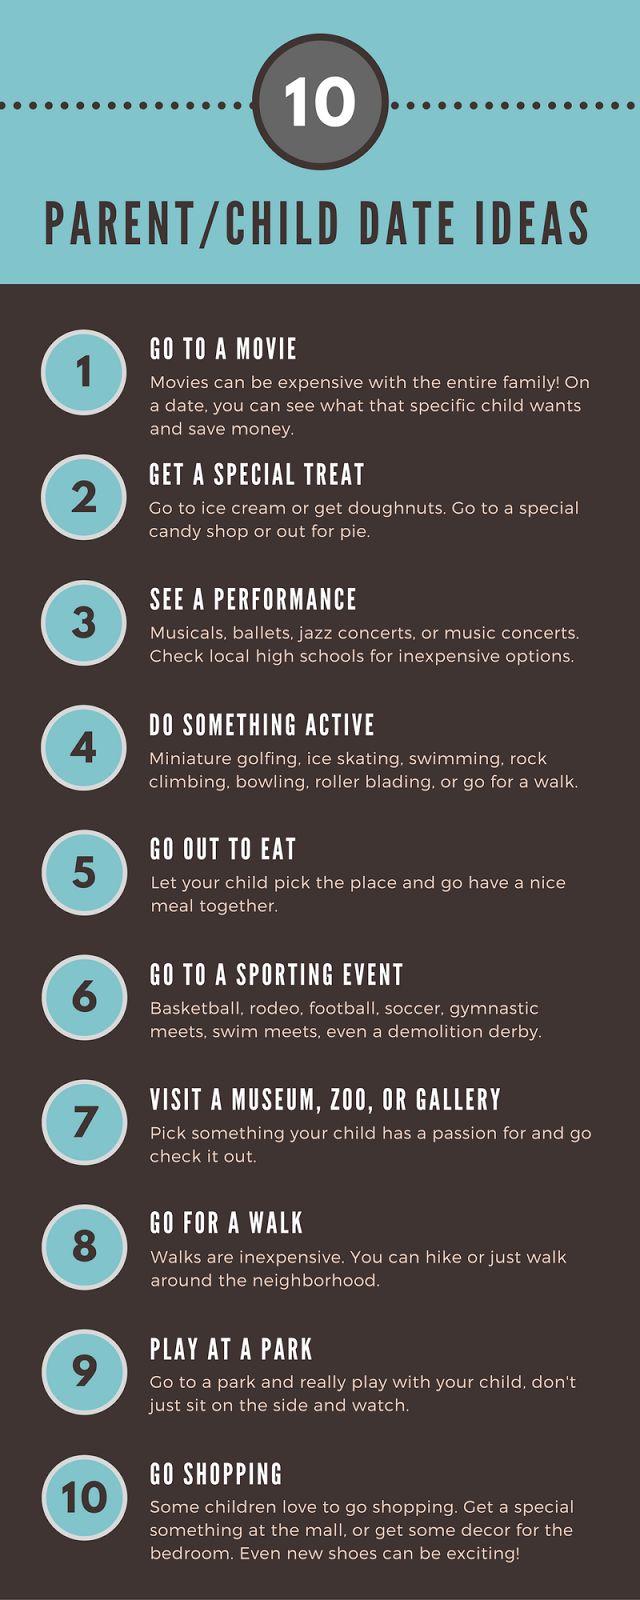 10 Parent/Child Date ideas and list